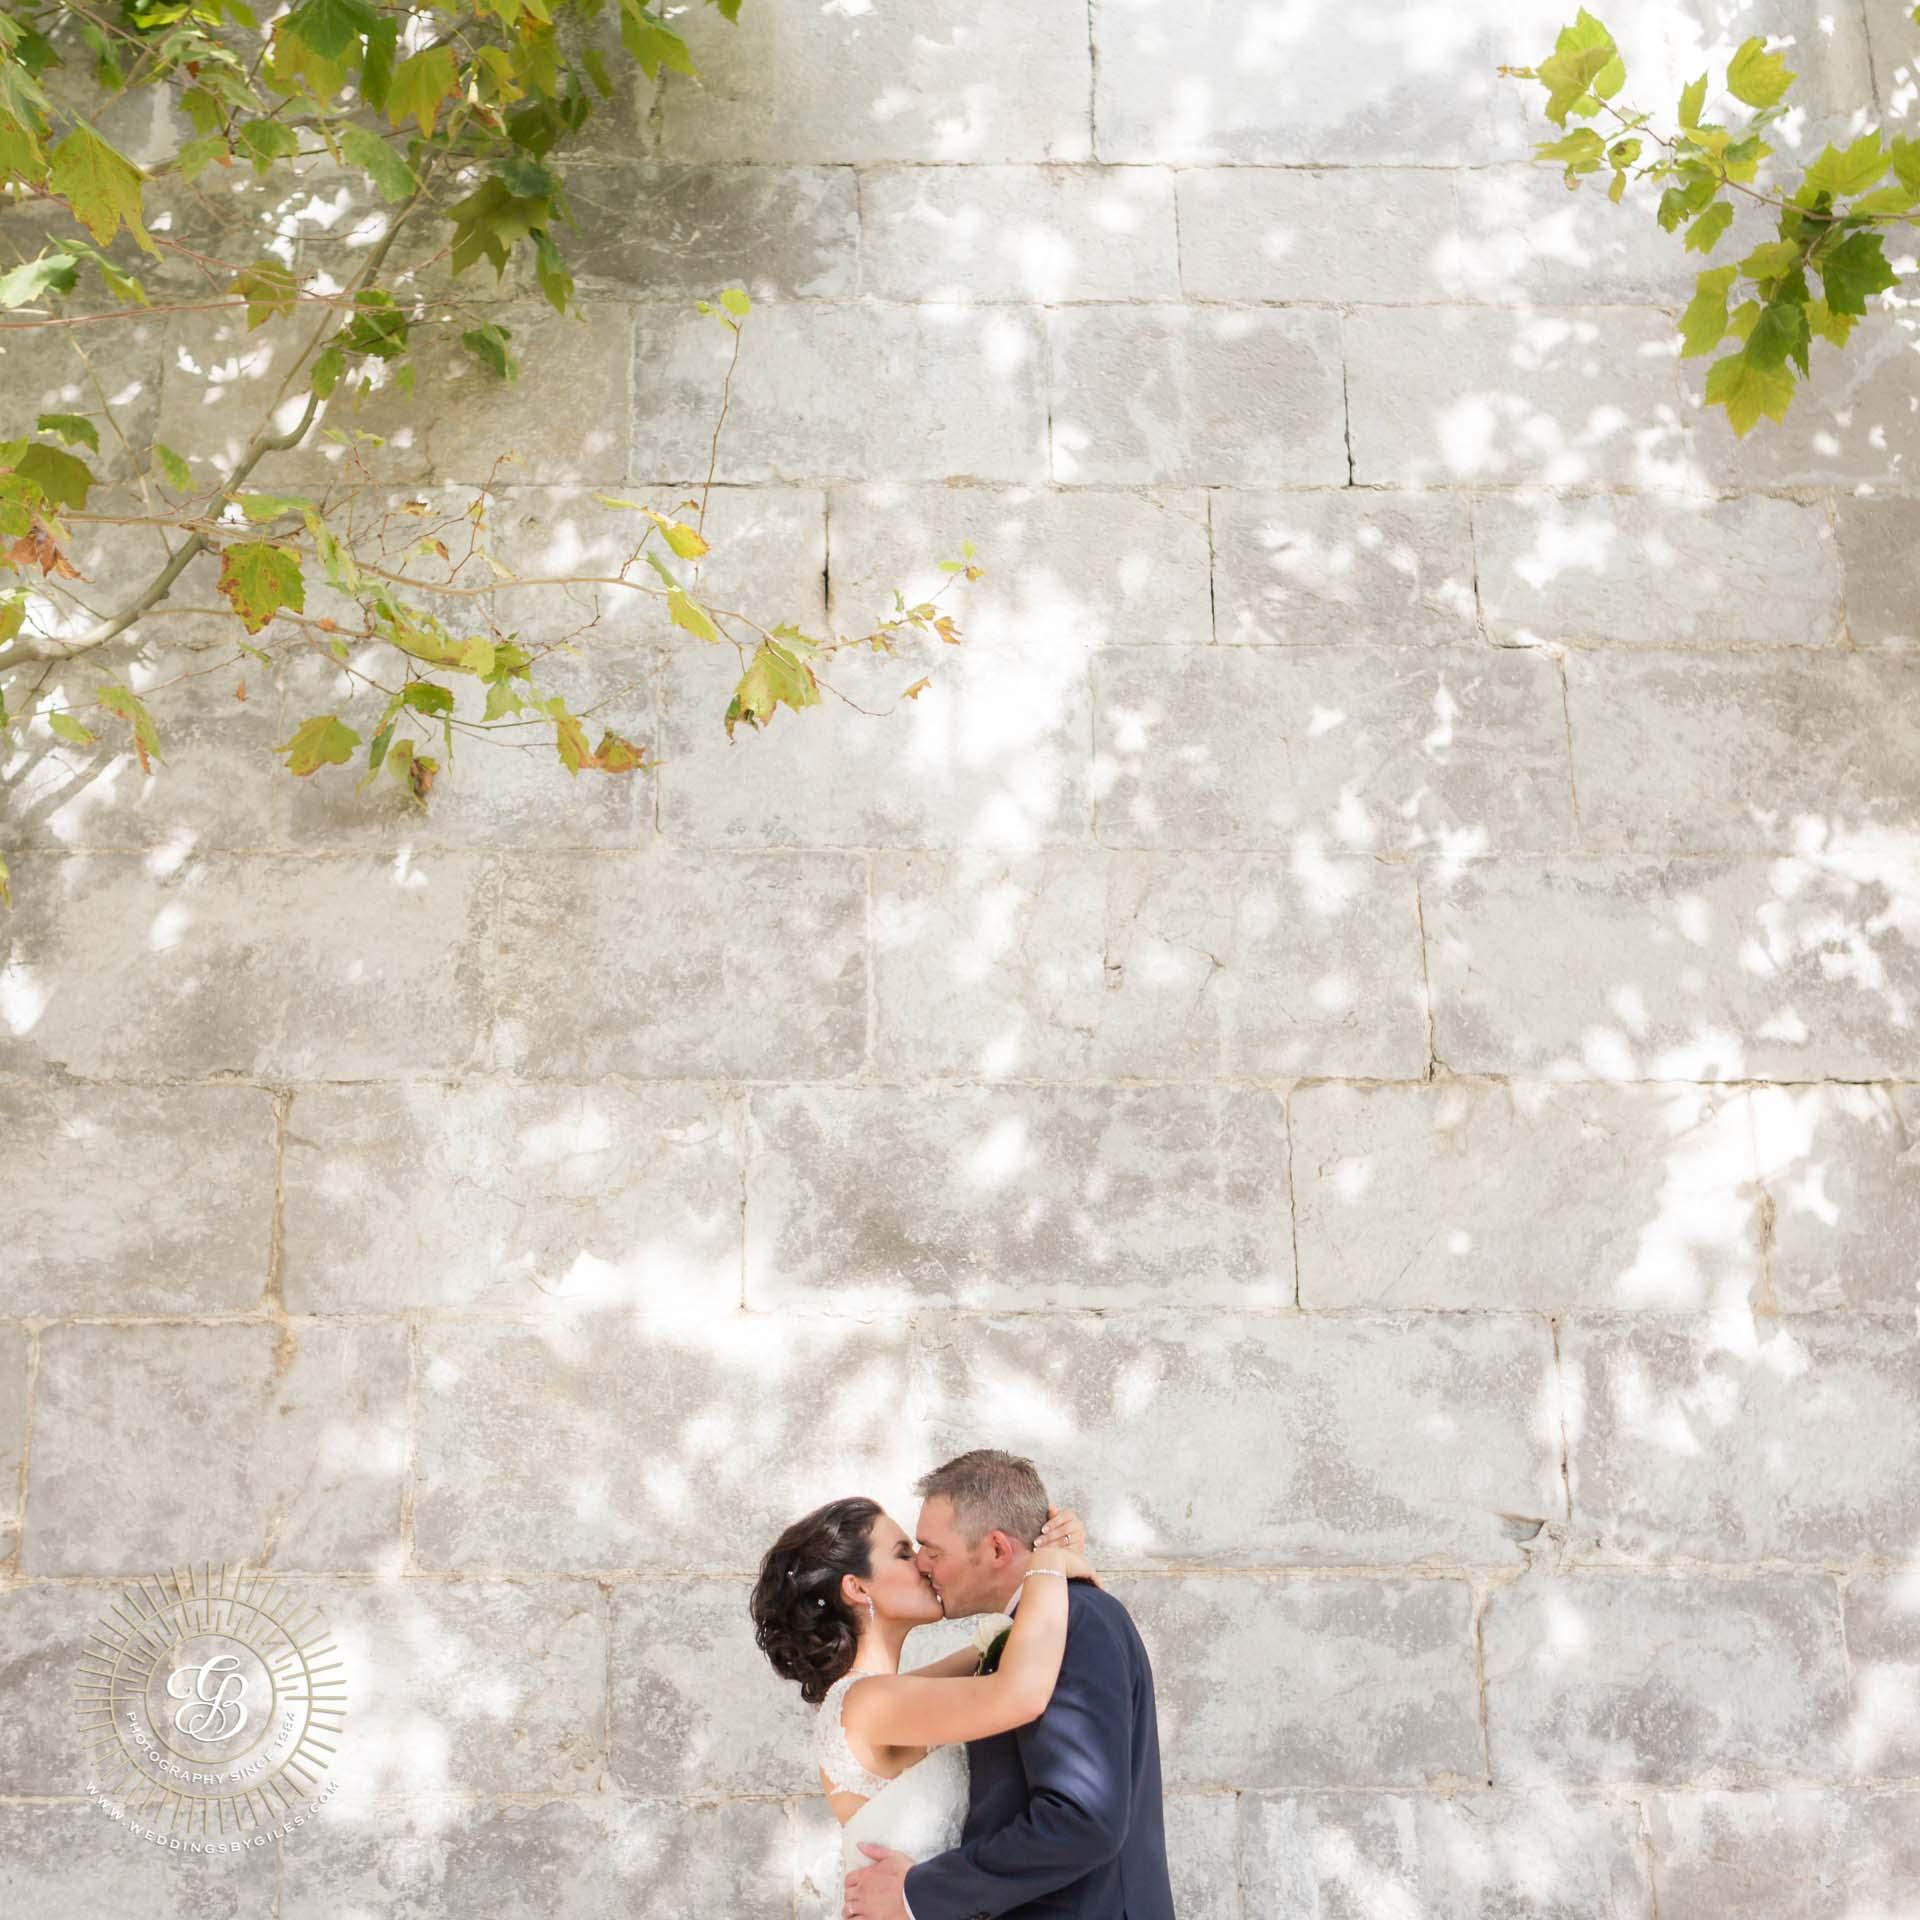 Wedding portrait by town wall